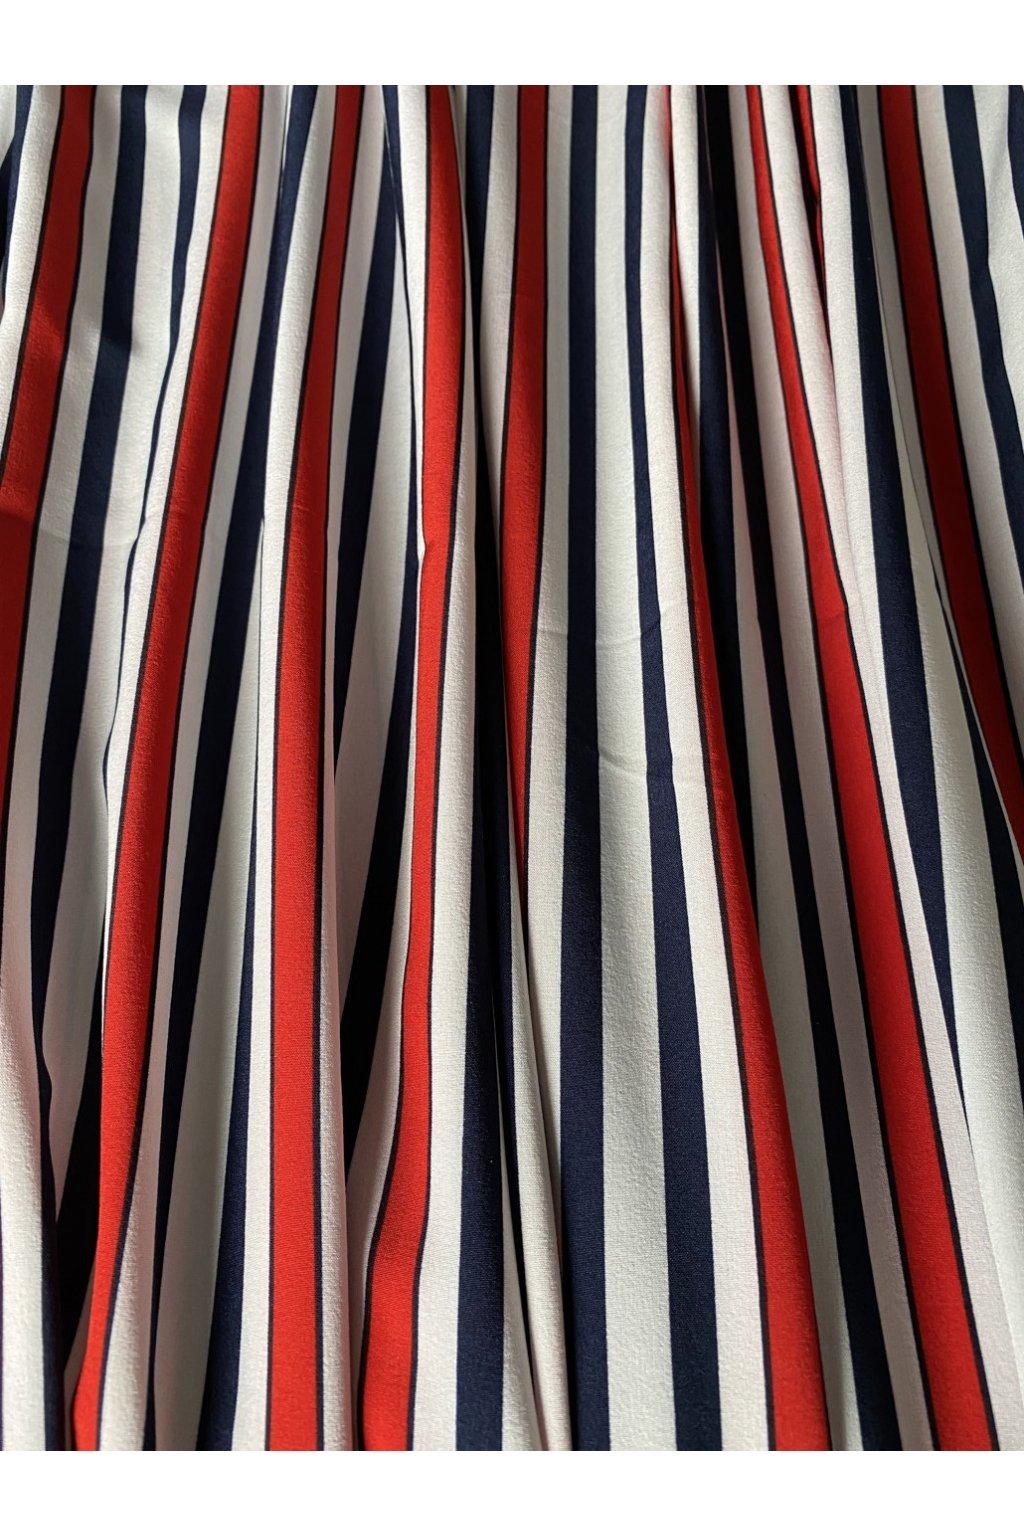 Šatovka silky modro-červené proužky